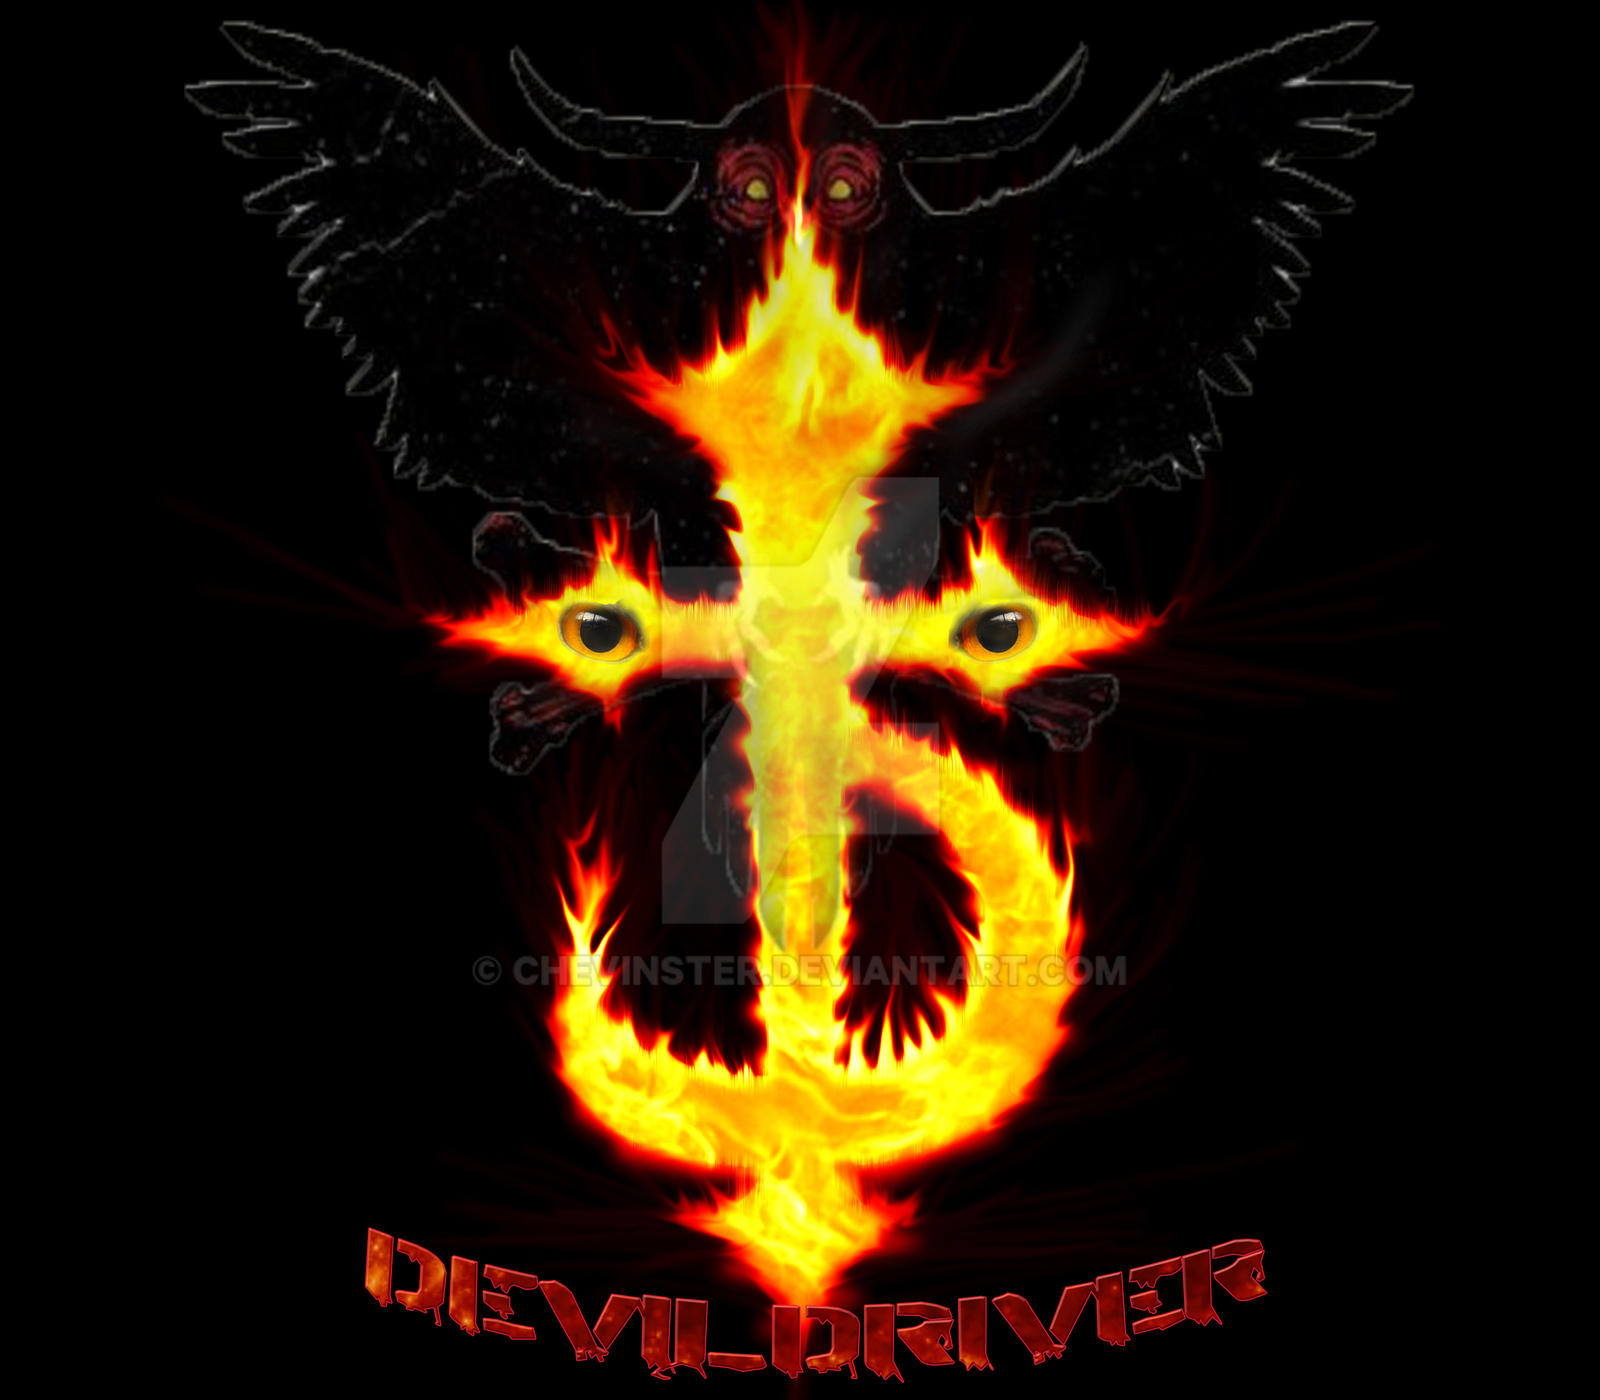 DevilDriver by Chevinster